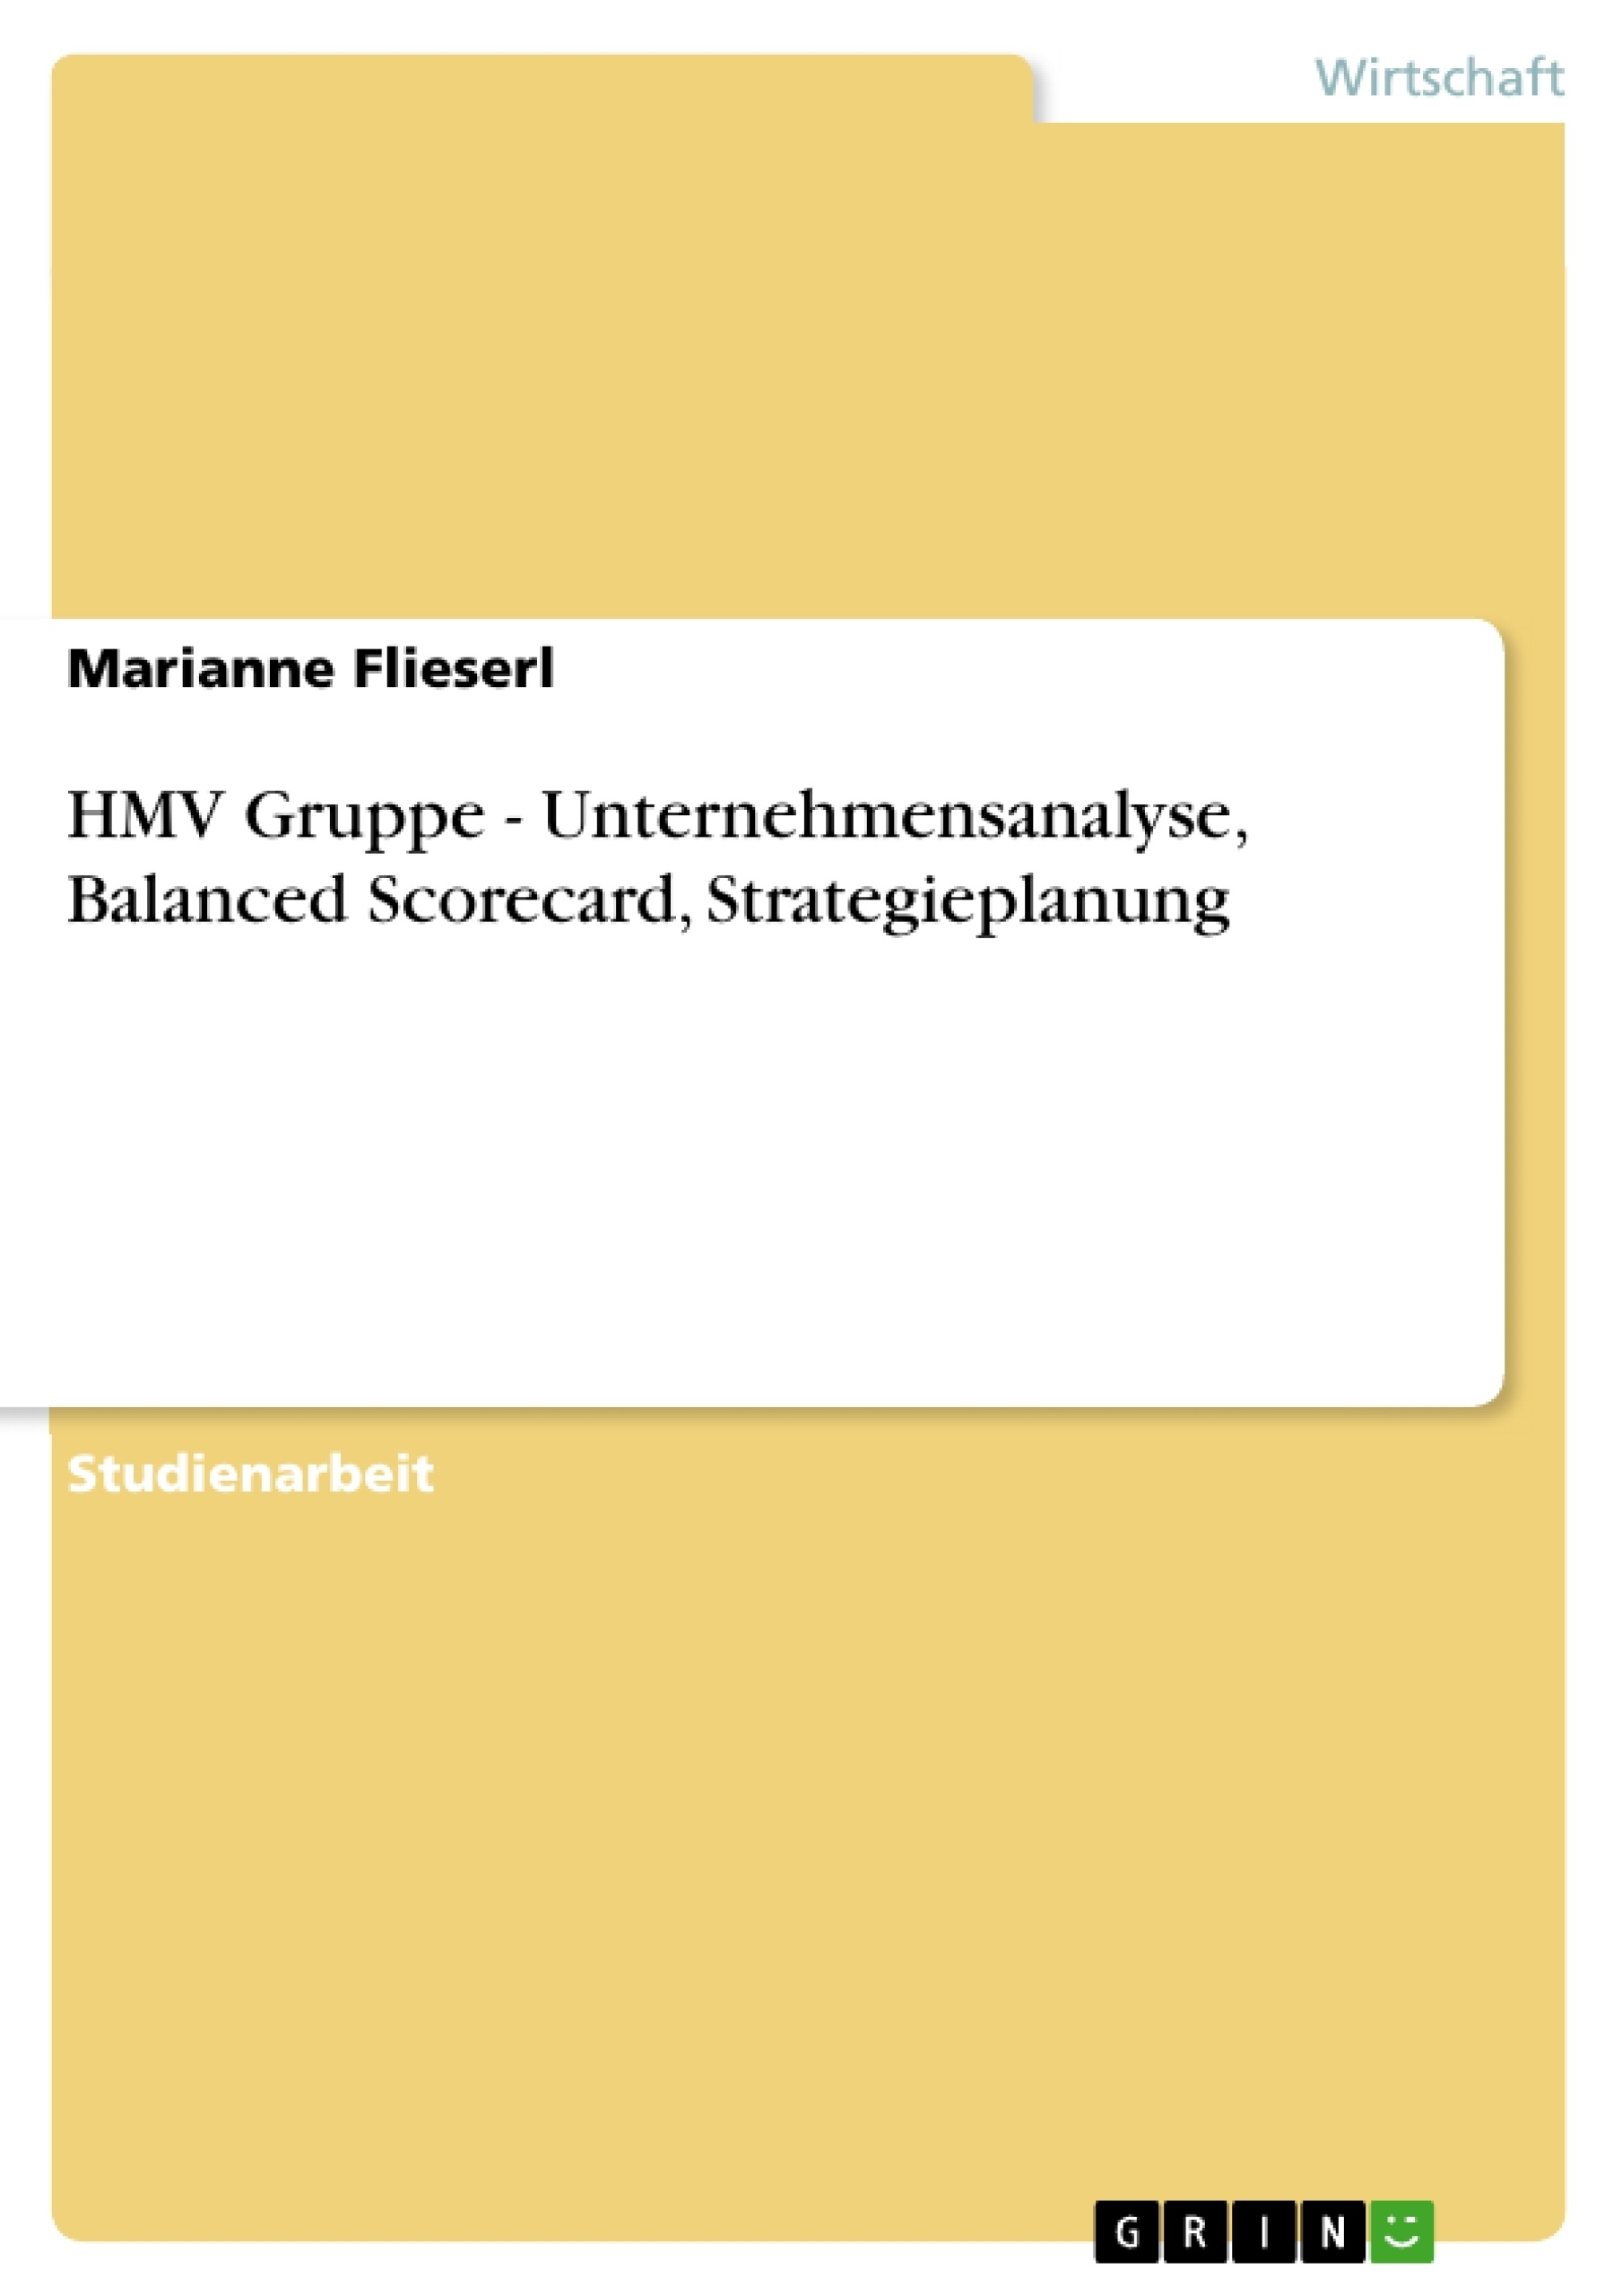 Titel: HMV Gruppe - Unternehmensanalyse, Balanced Scorecard, Strategieplanung